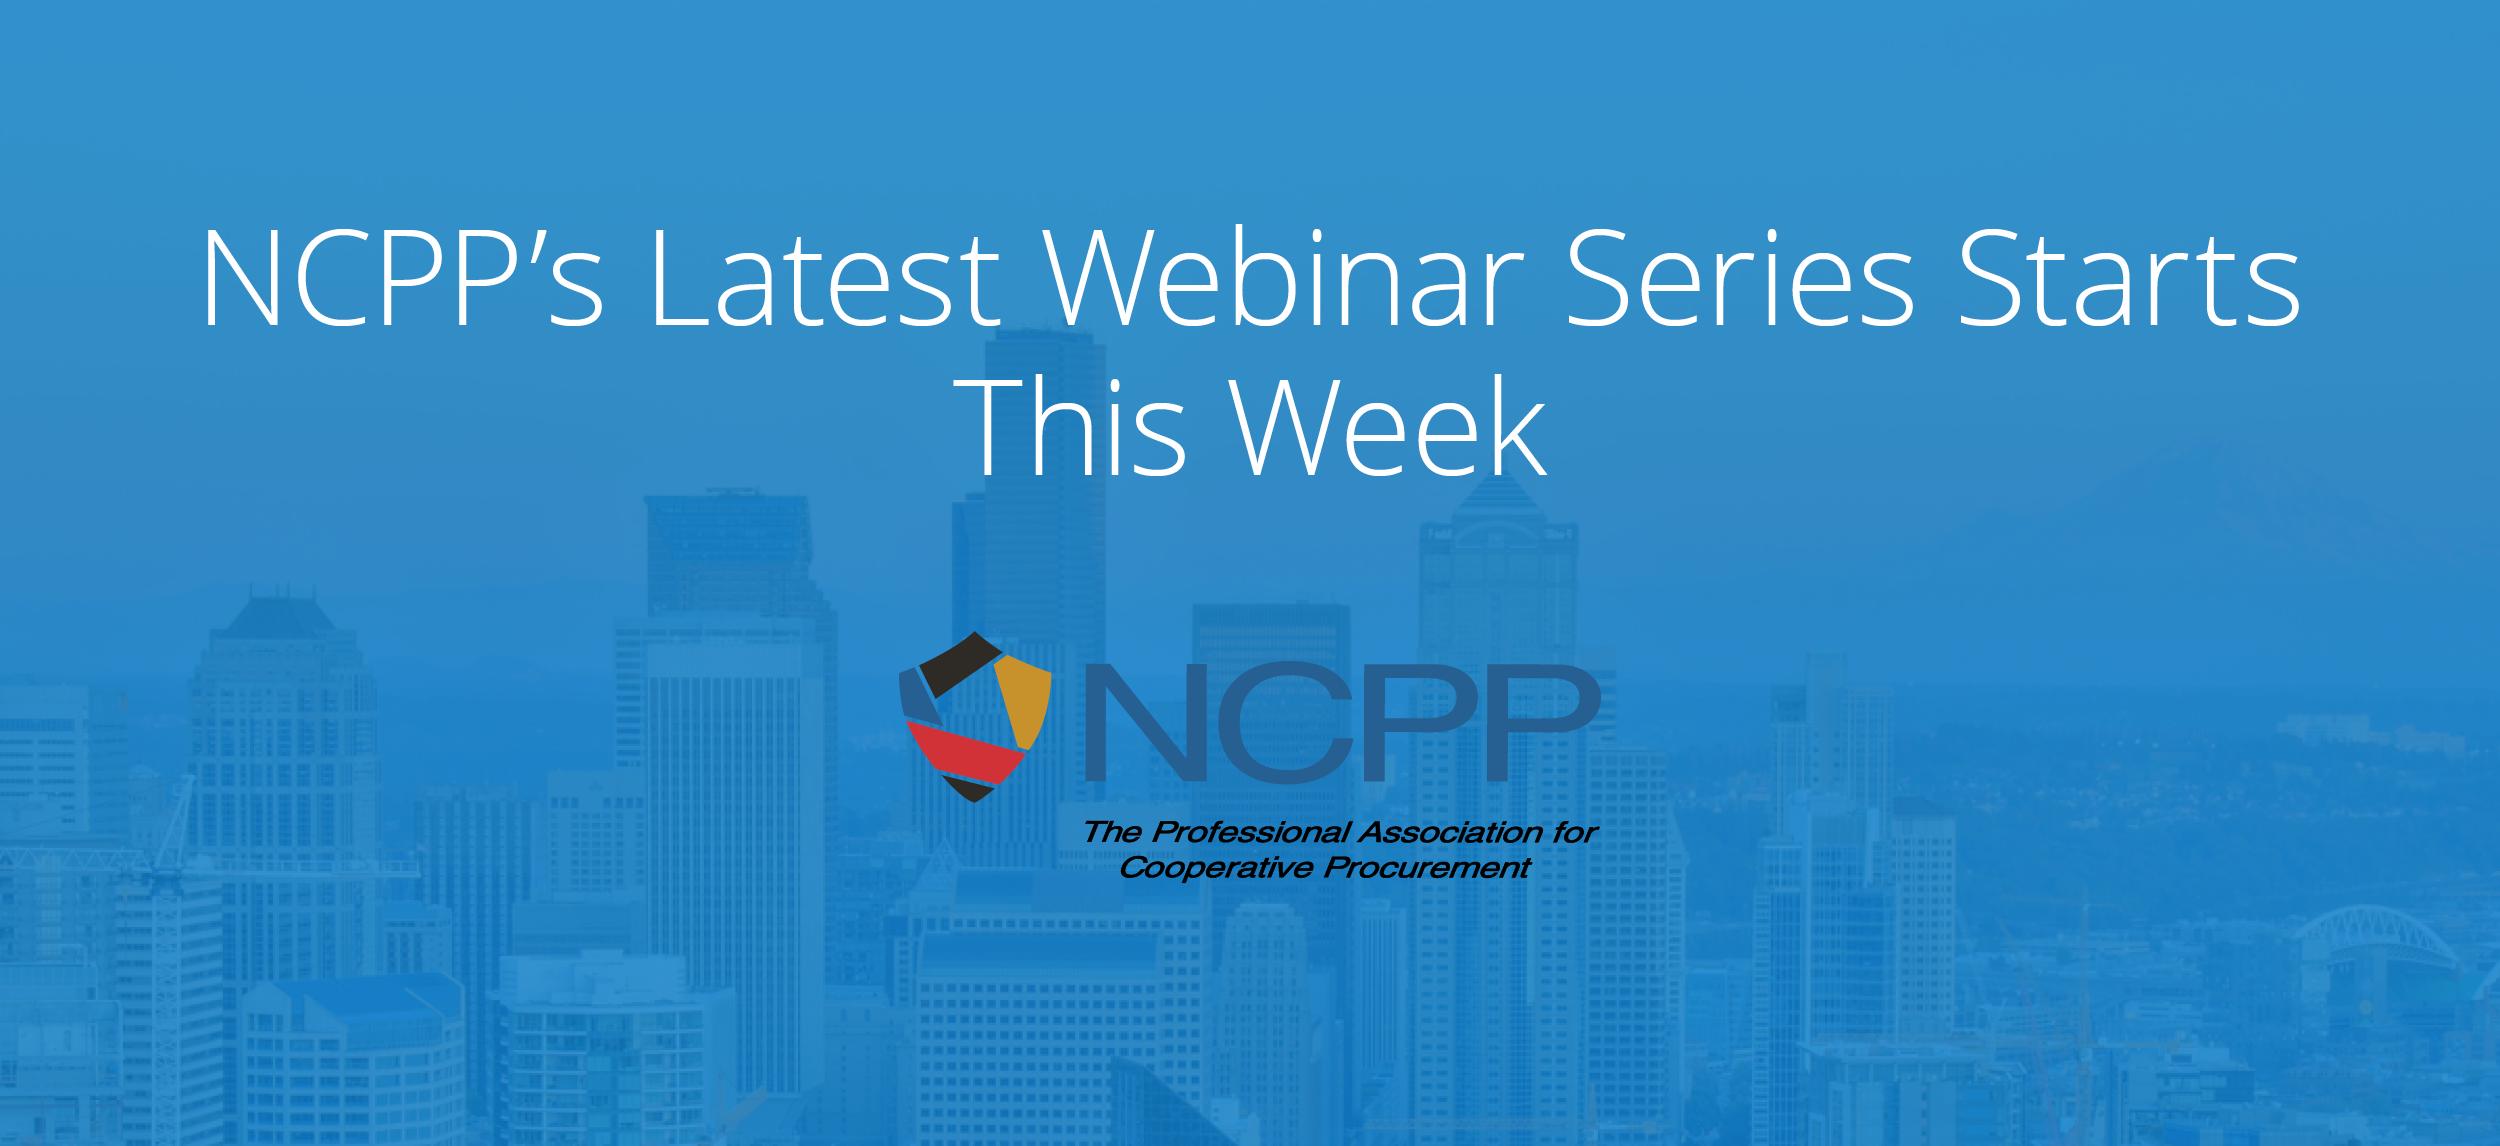 Register for NCPP's Free Emergency Preparedness Webinar Series